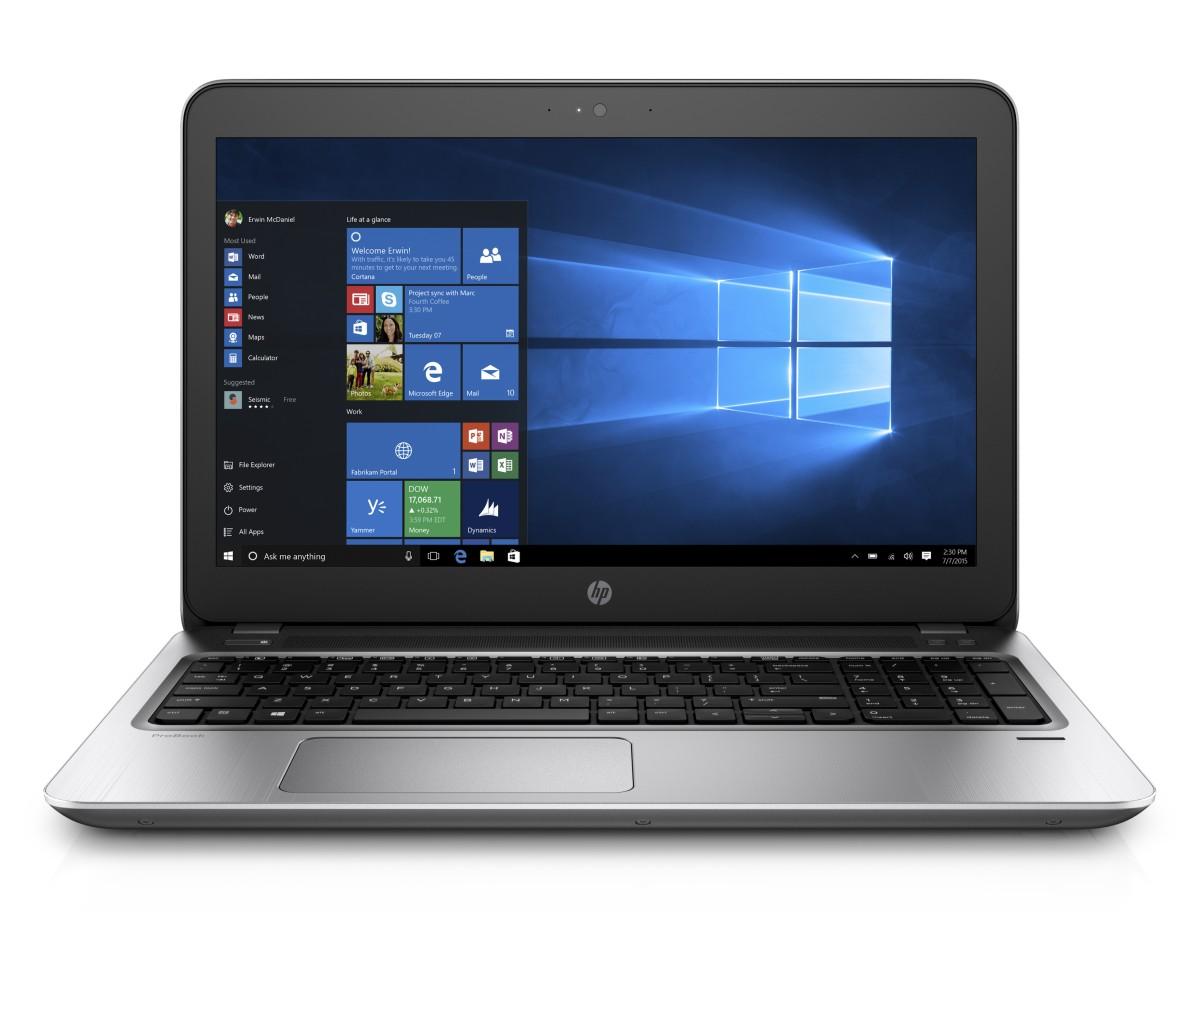 HP ProBook 450 G4 FHD/i5-7200U/8G/256SSD/W10P+Off